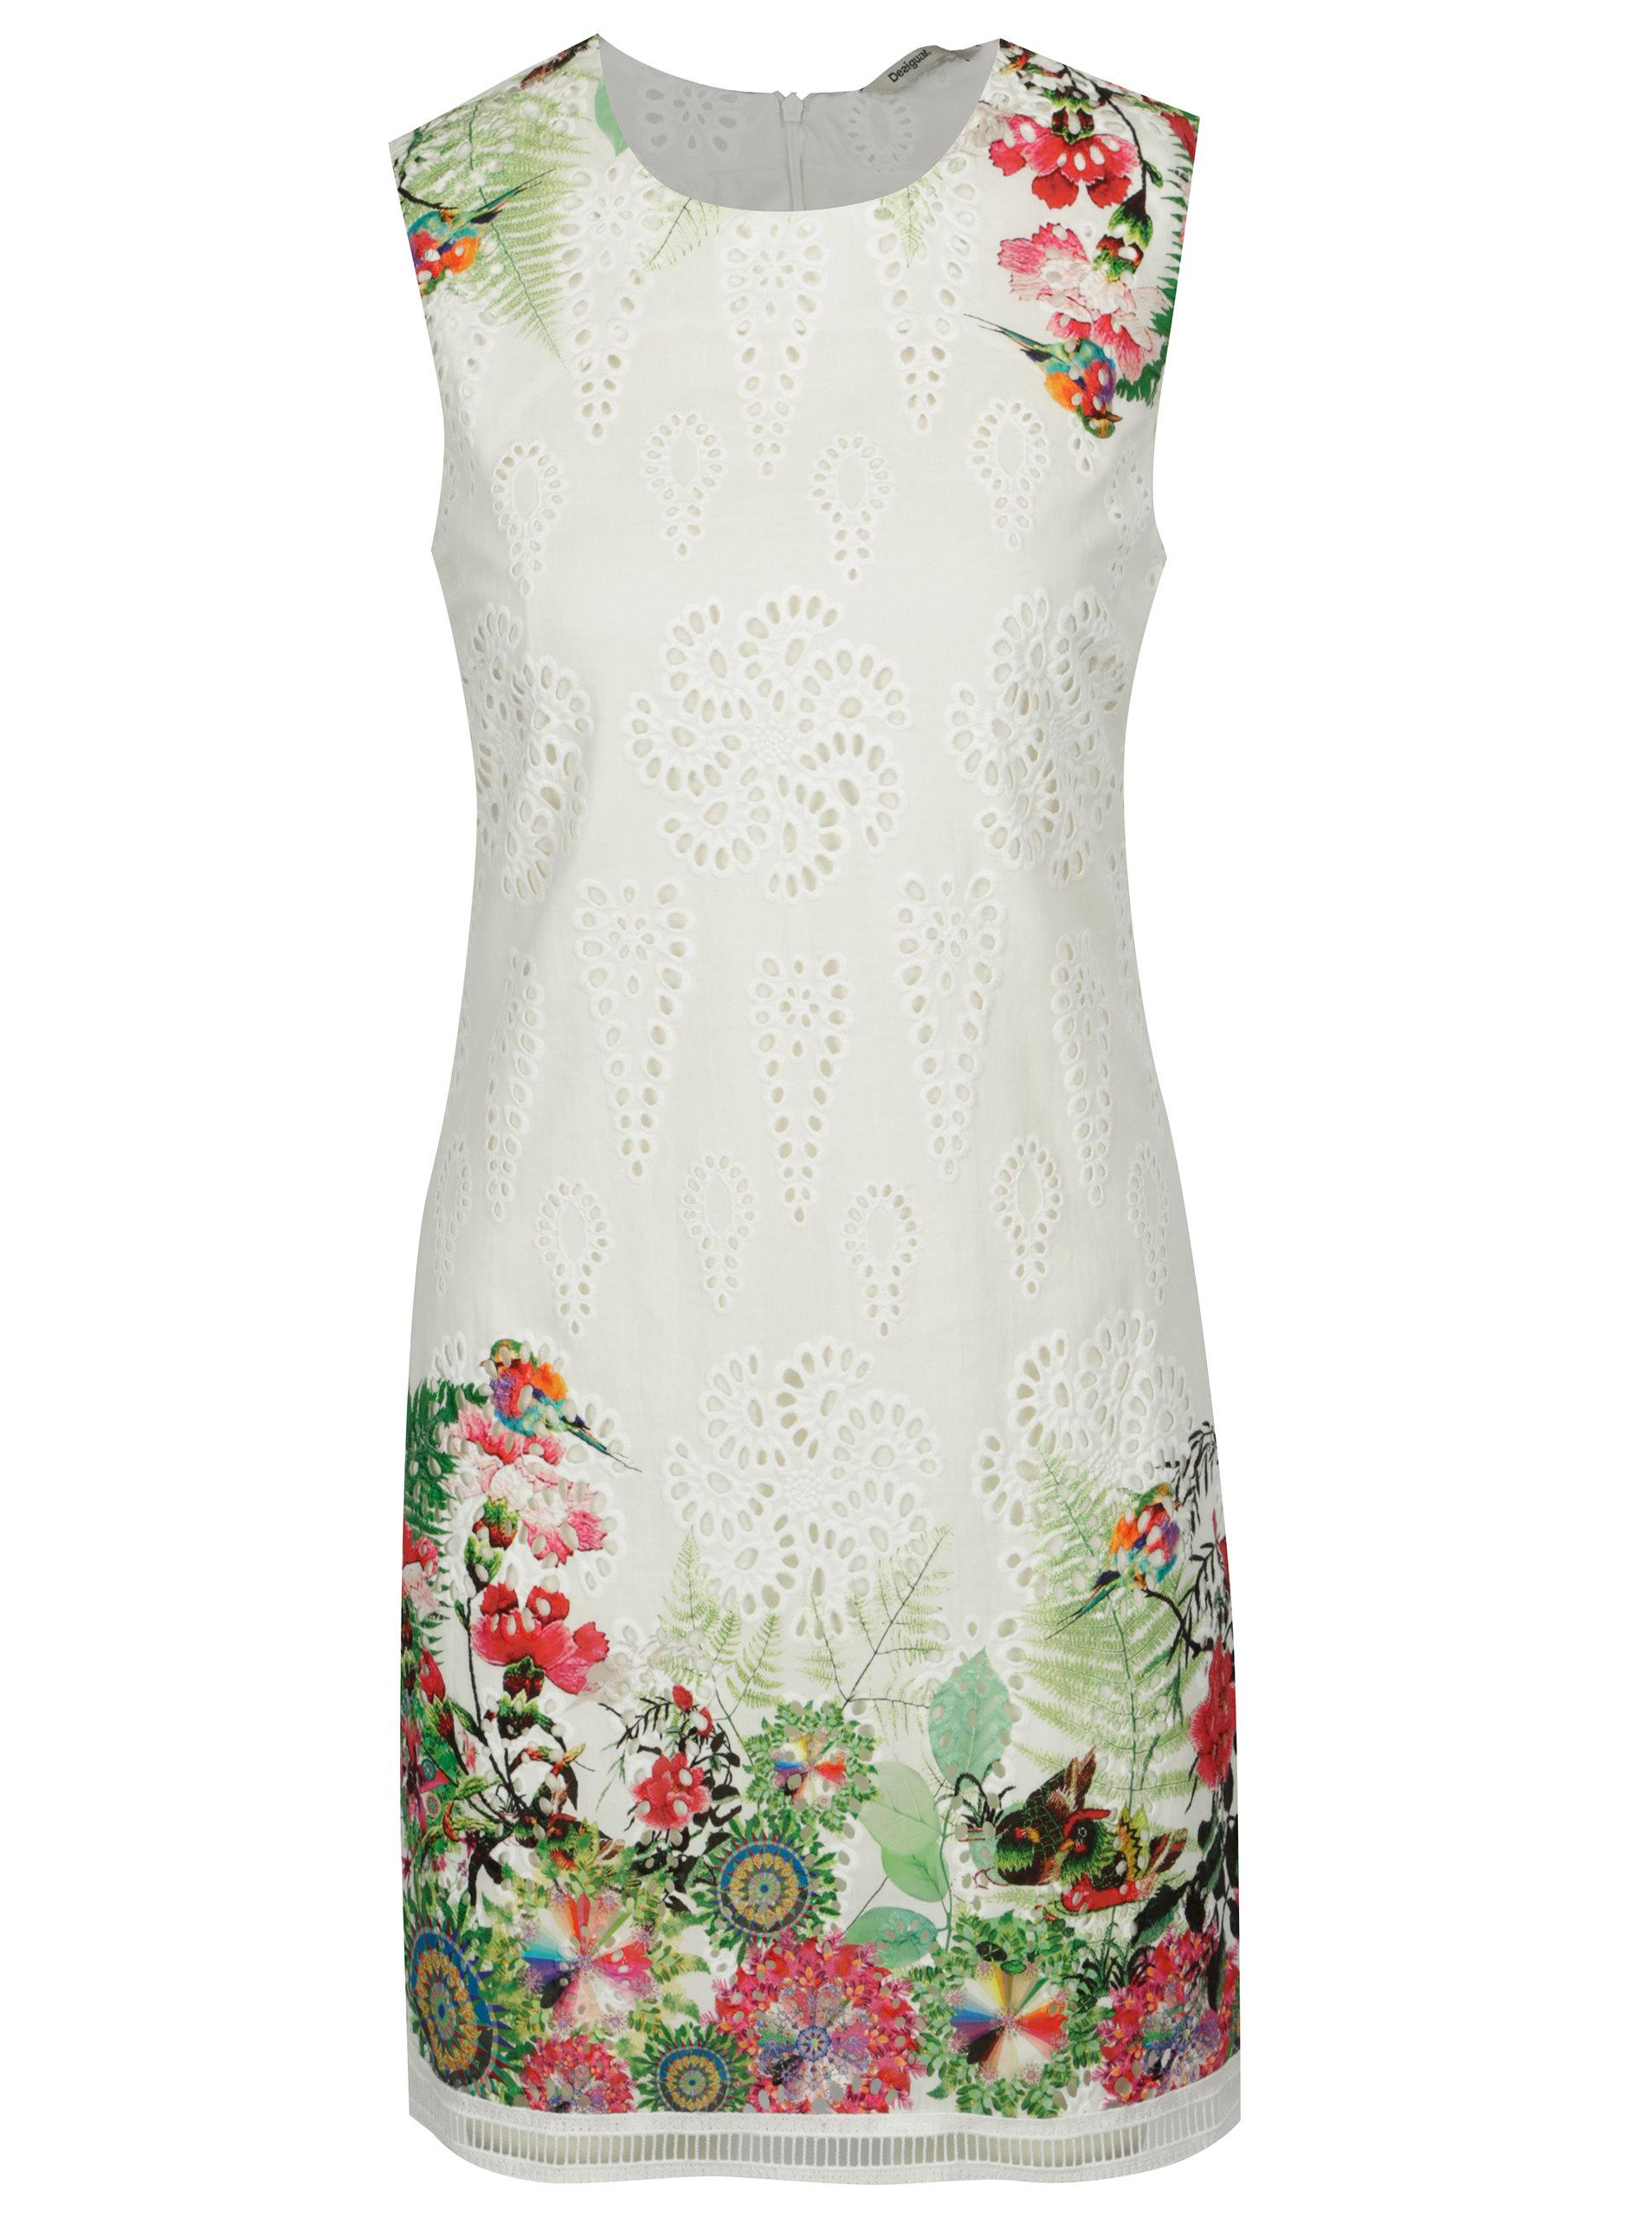 Bílé květované šaty Desigual Magarita ... 1a9a931b8b3